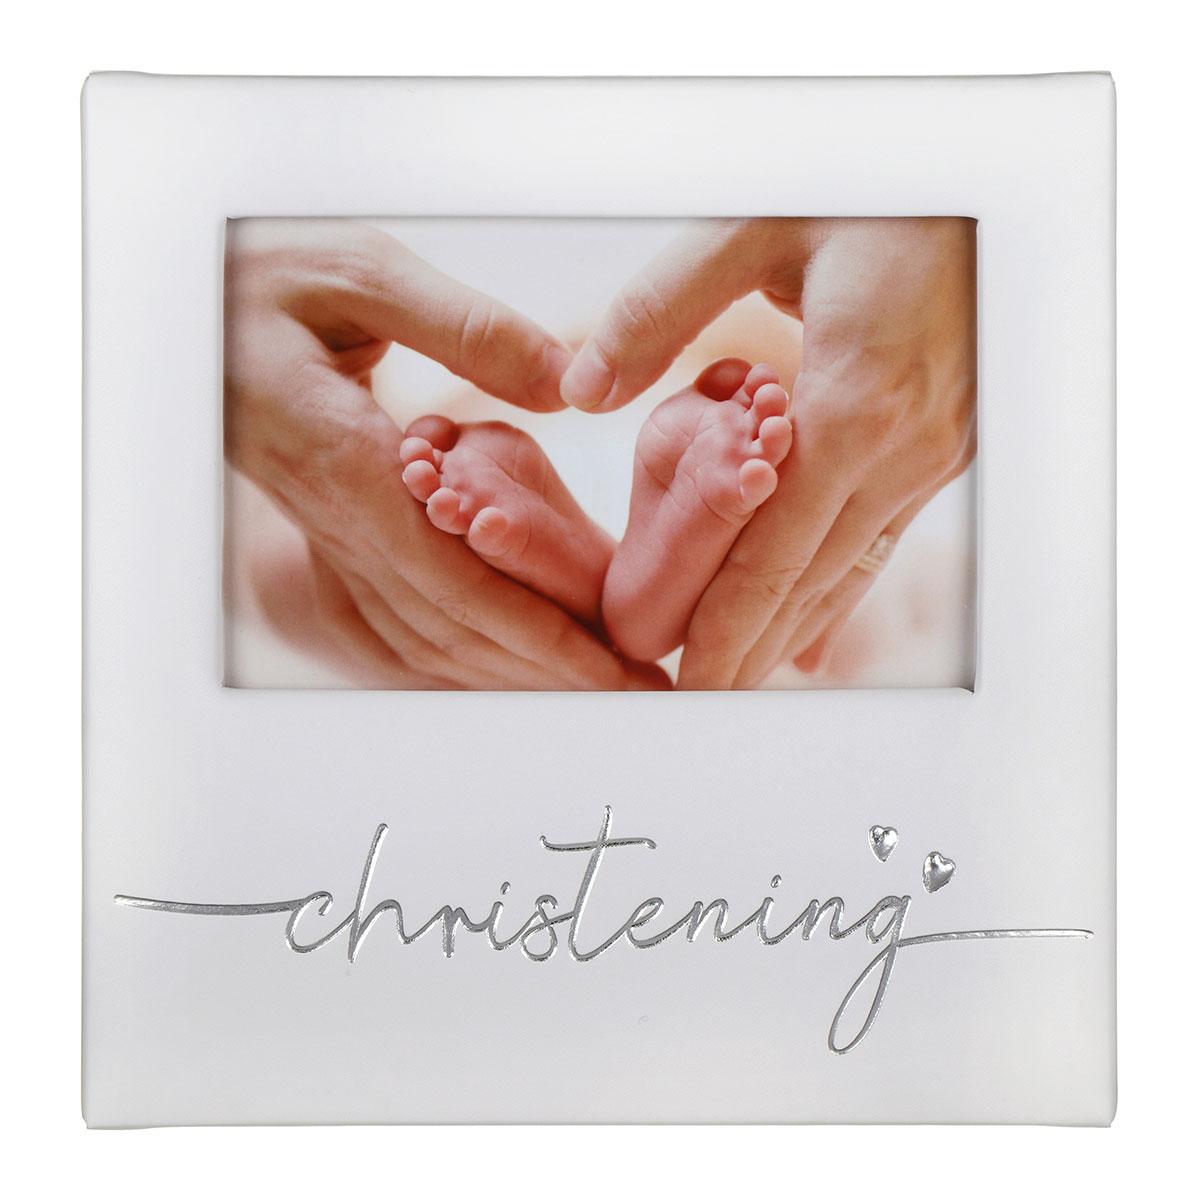 Christening Photo Frame 6x4